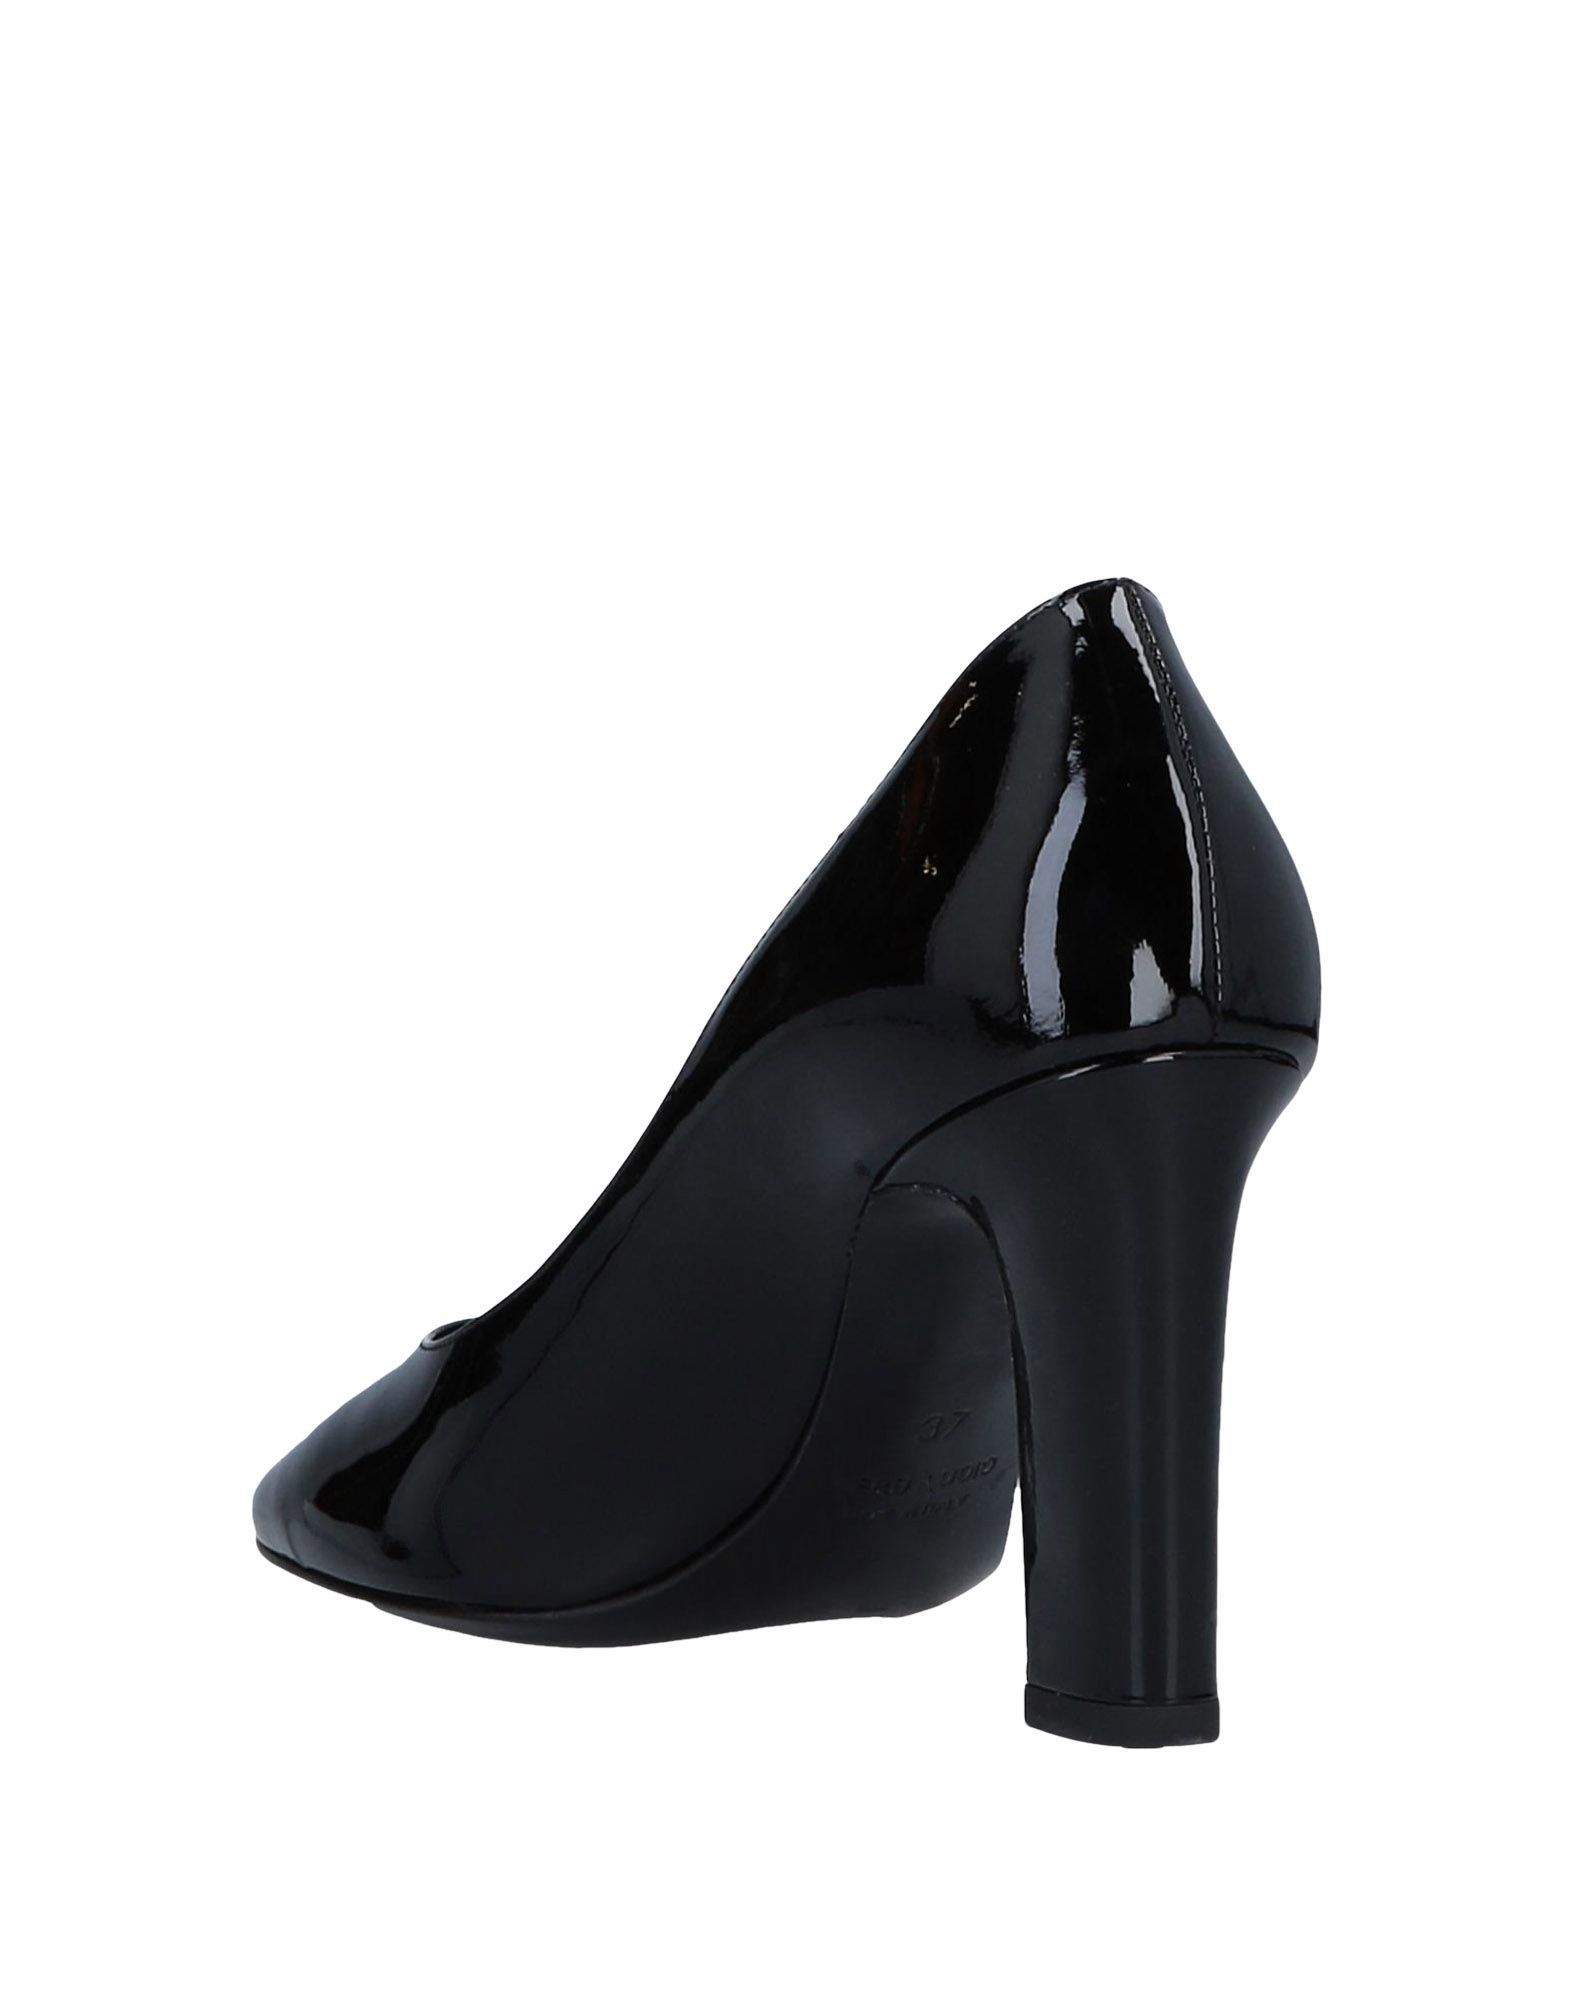 Stilvolle billige Schuhe Fratelli Karida 11517377XU Pumps Damen  11517377XU Karida 85485d